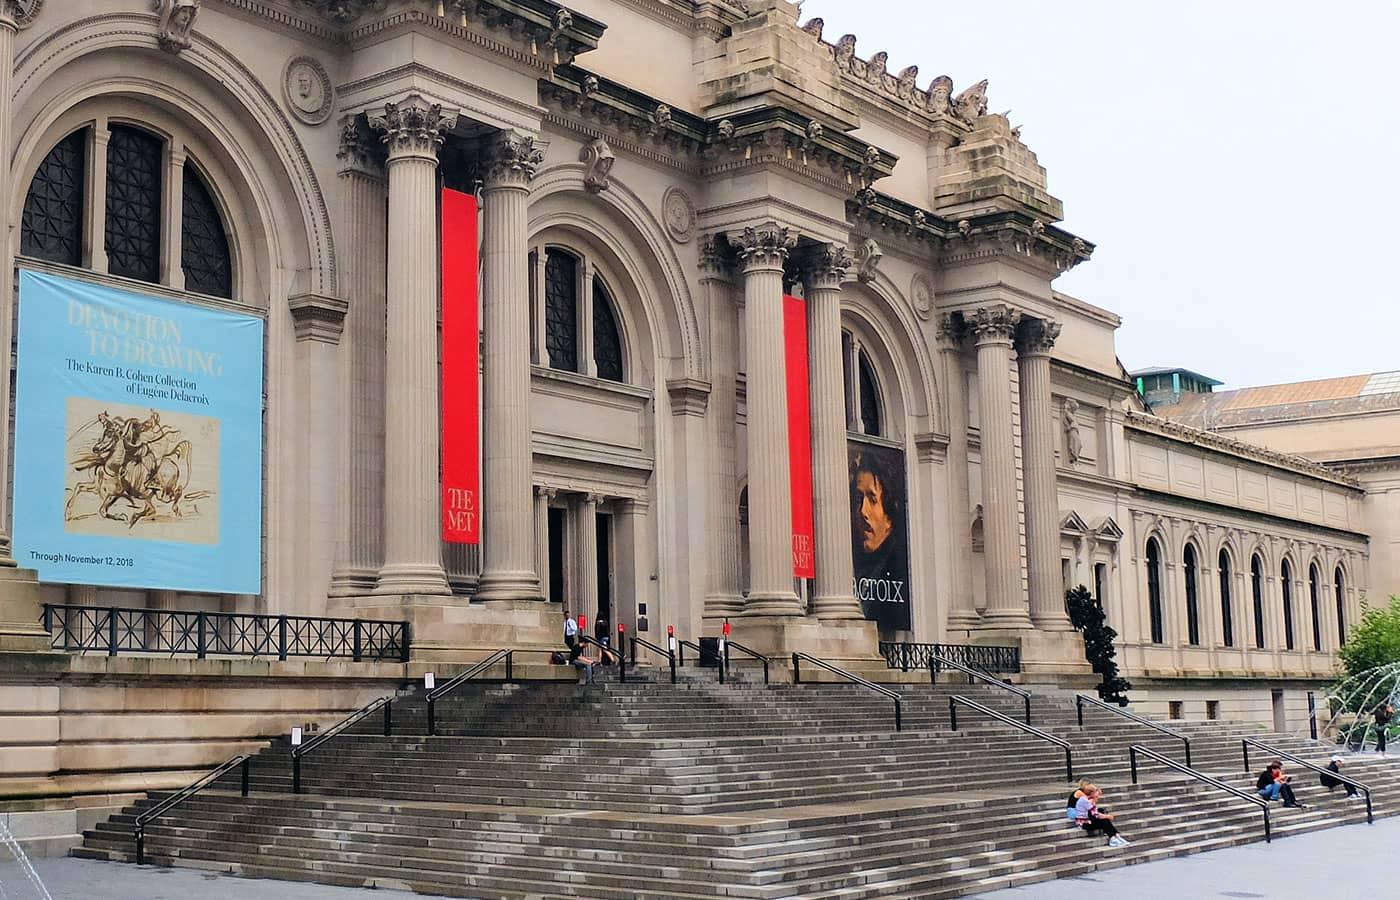 Gossip Girl rundtur - Trapporna vid The Met